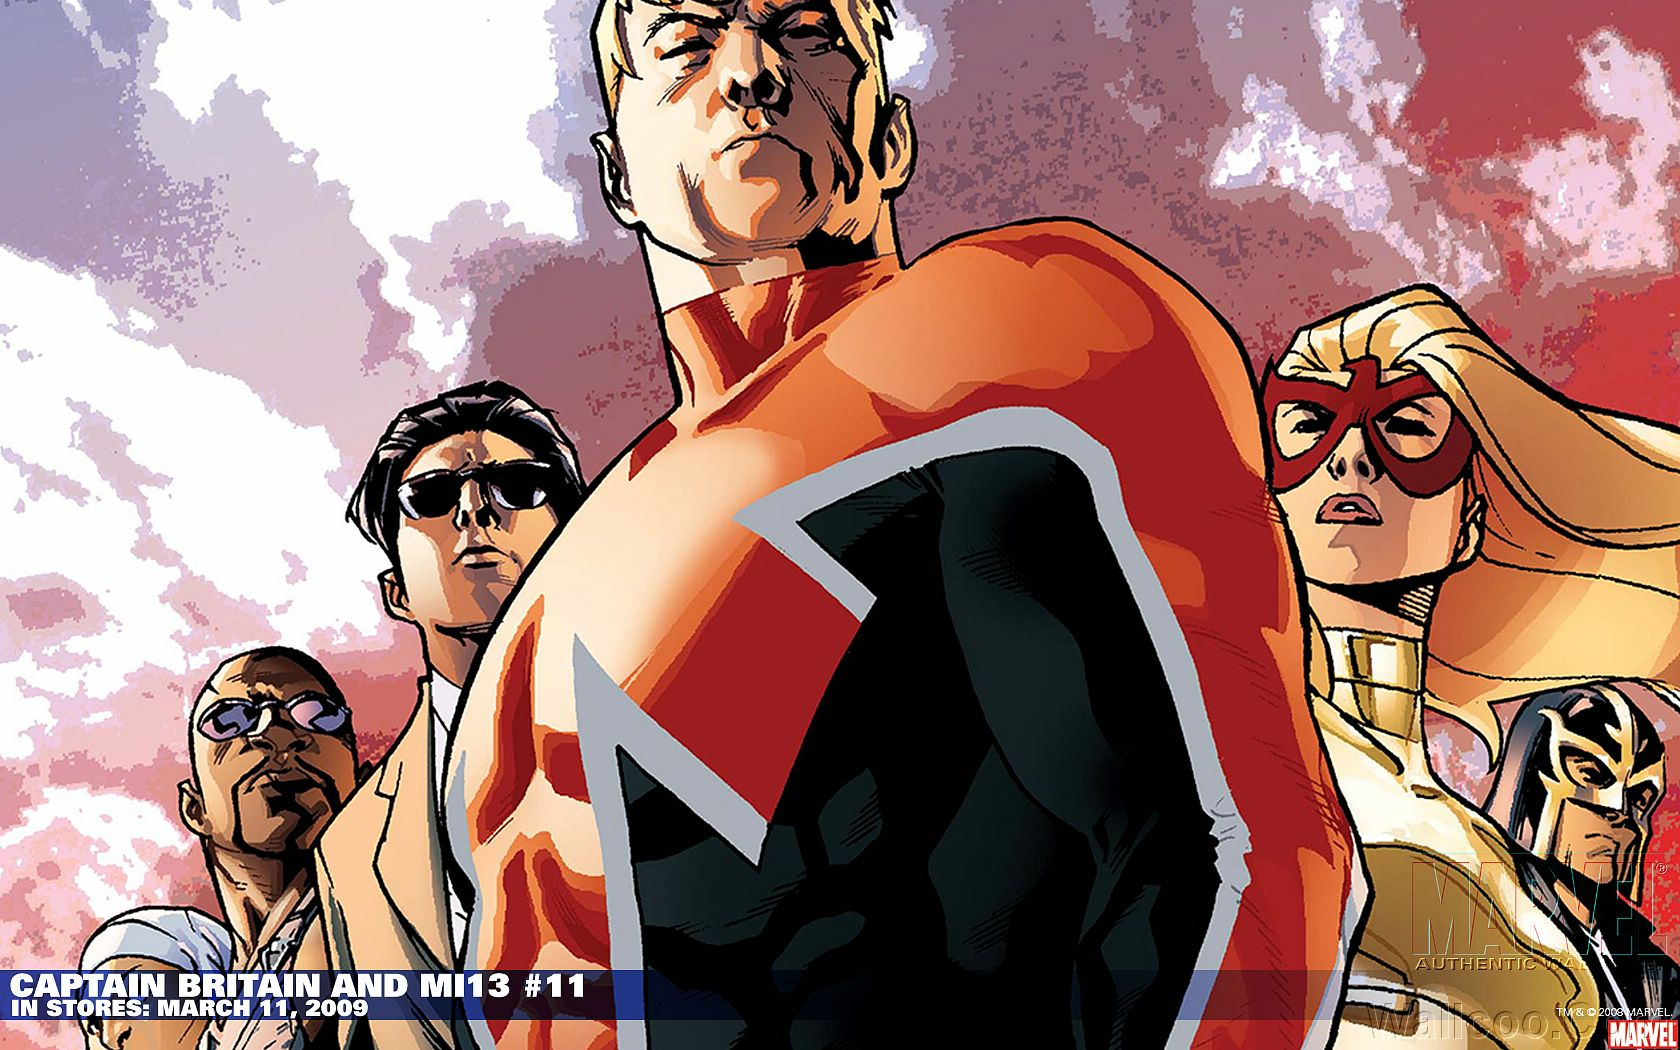 Captain Britain and Mi13 11   Marvel Comics Wallpaper 13 1680x1050